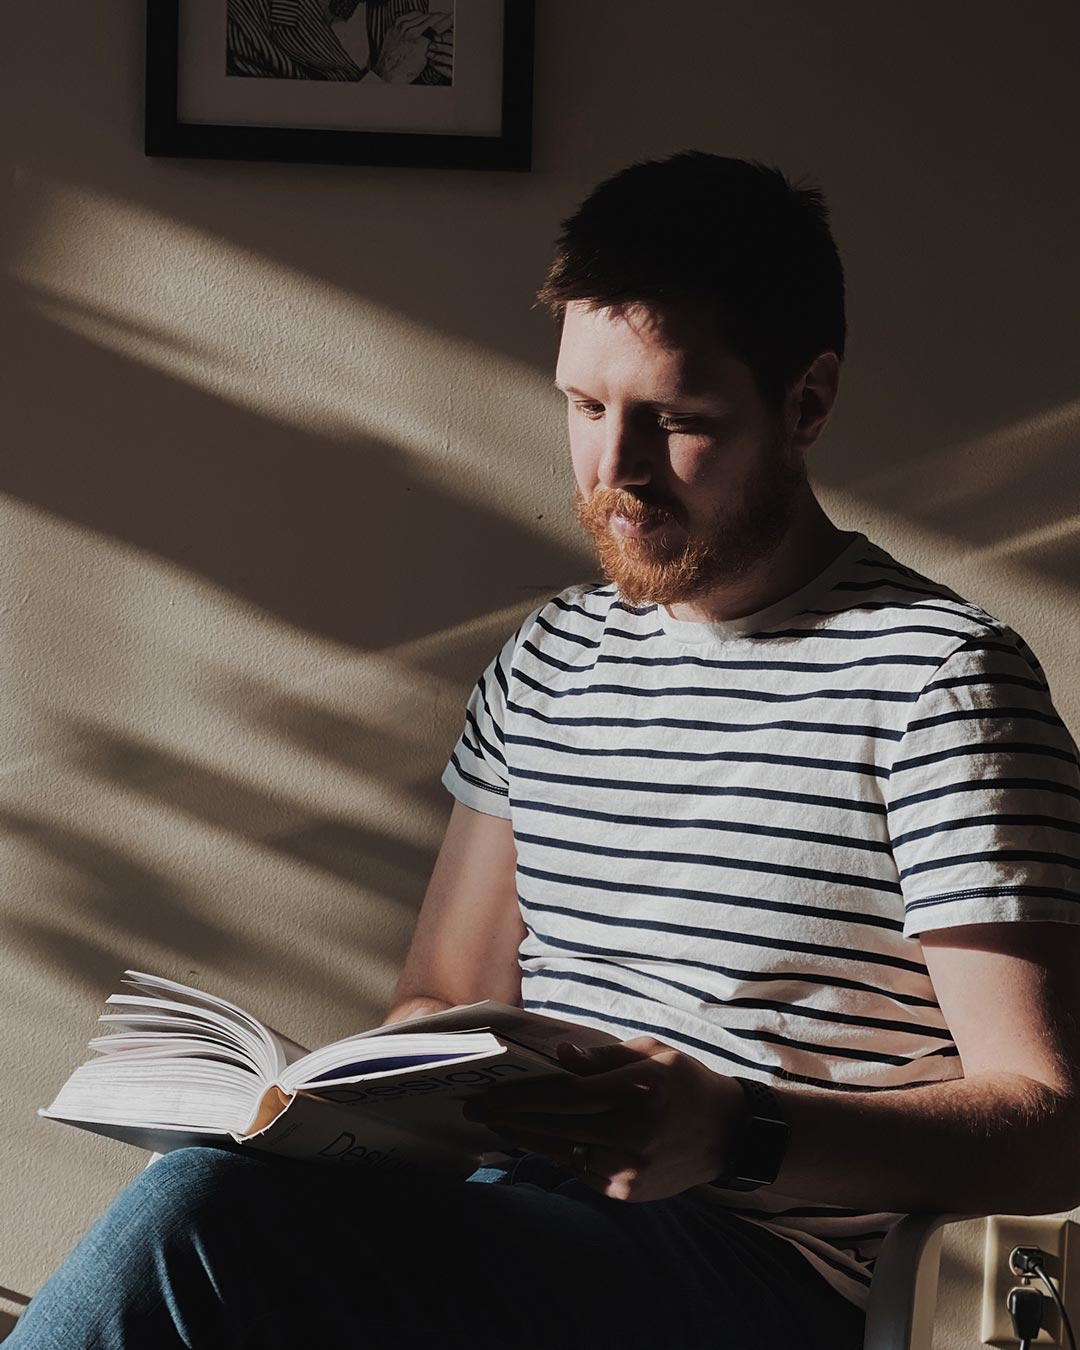 thomas clapper in christian studies online class